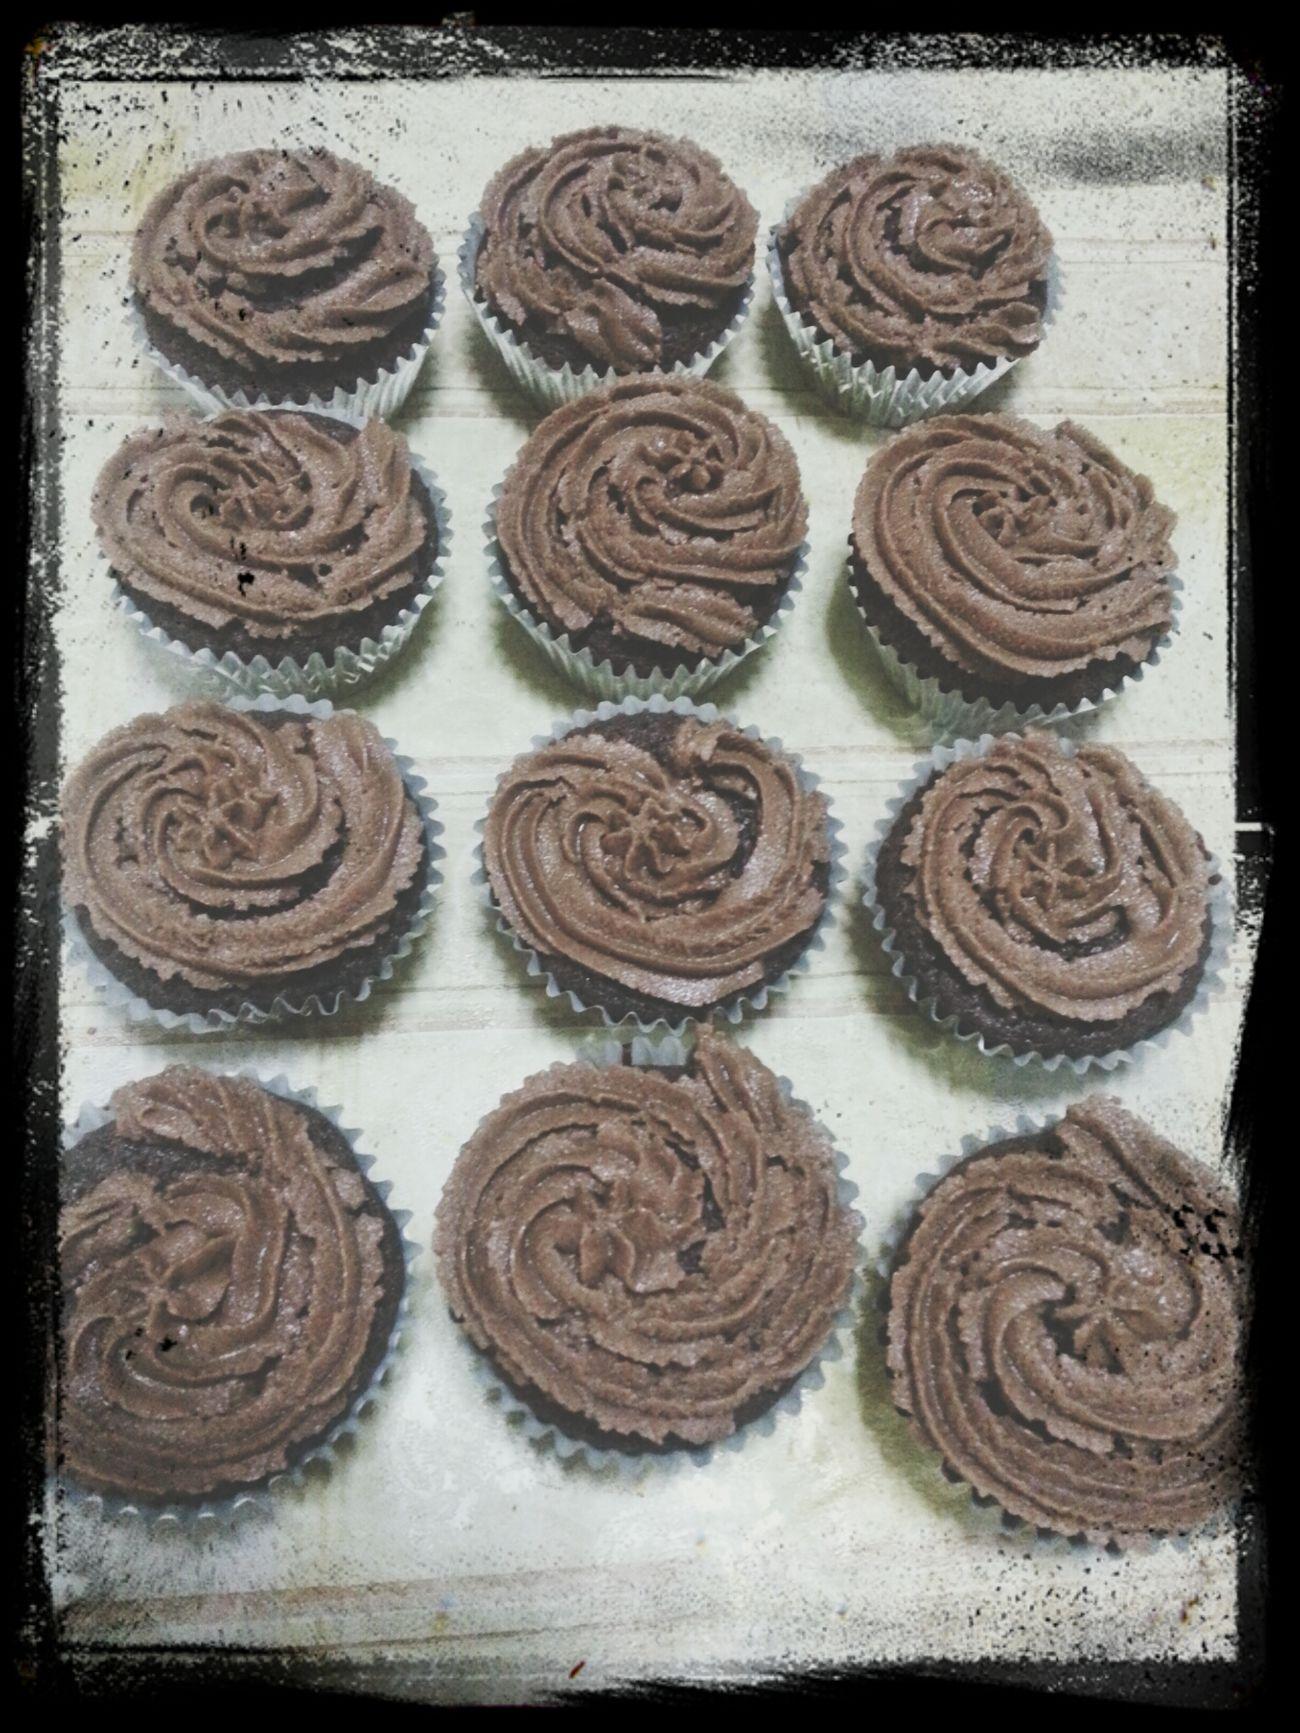 Cupcakes Chocolatebuttercream Forsale Sweet plain